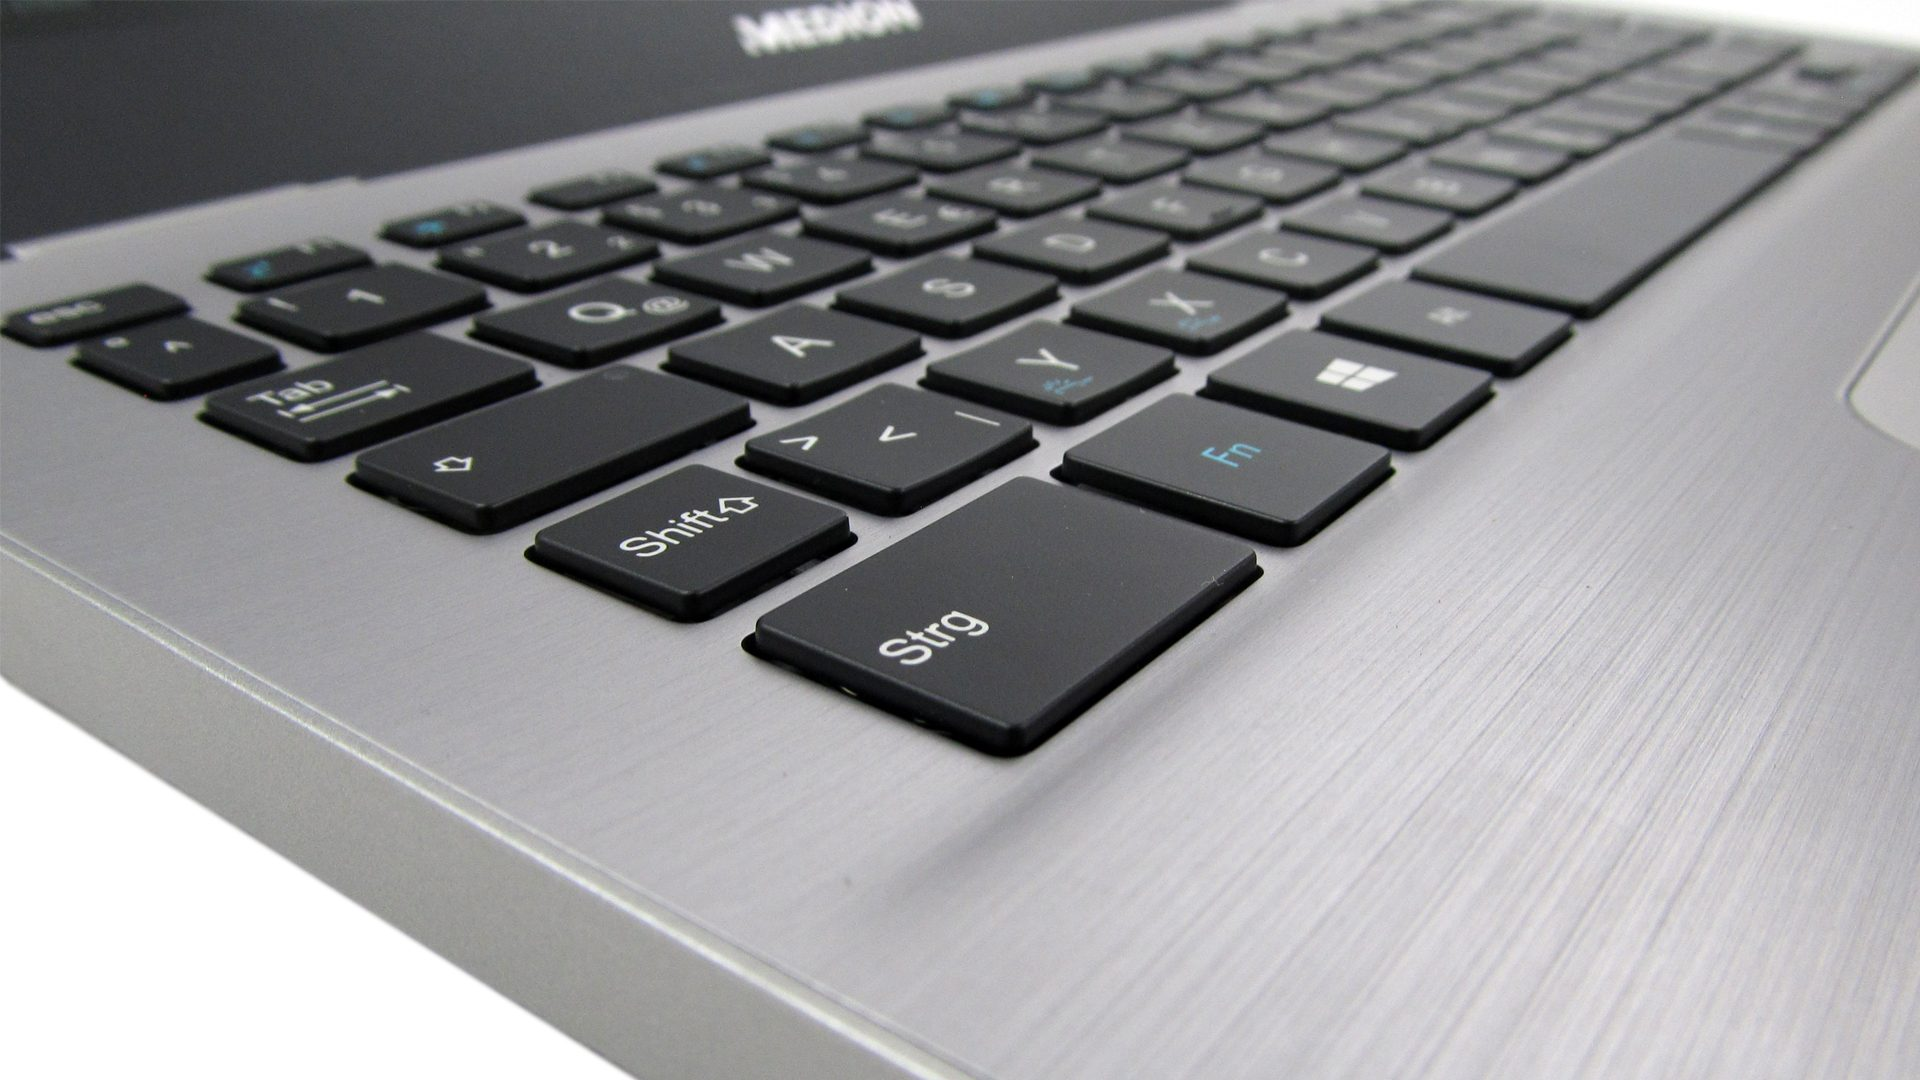 Medion_Akoya_S3409_Tastatur-1